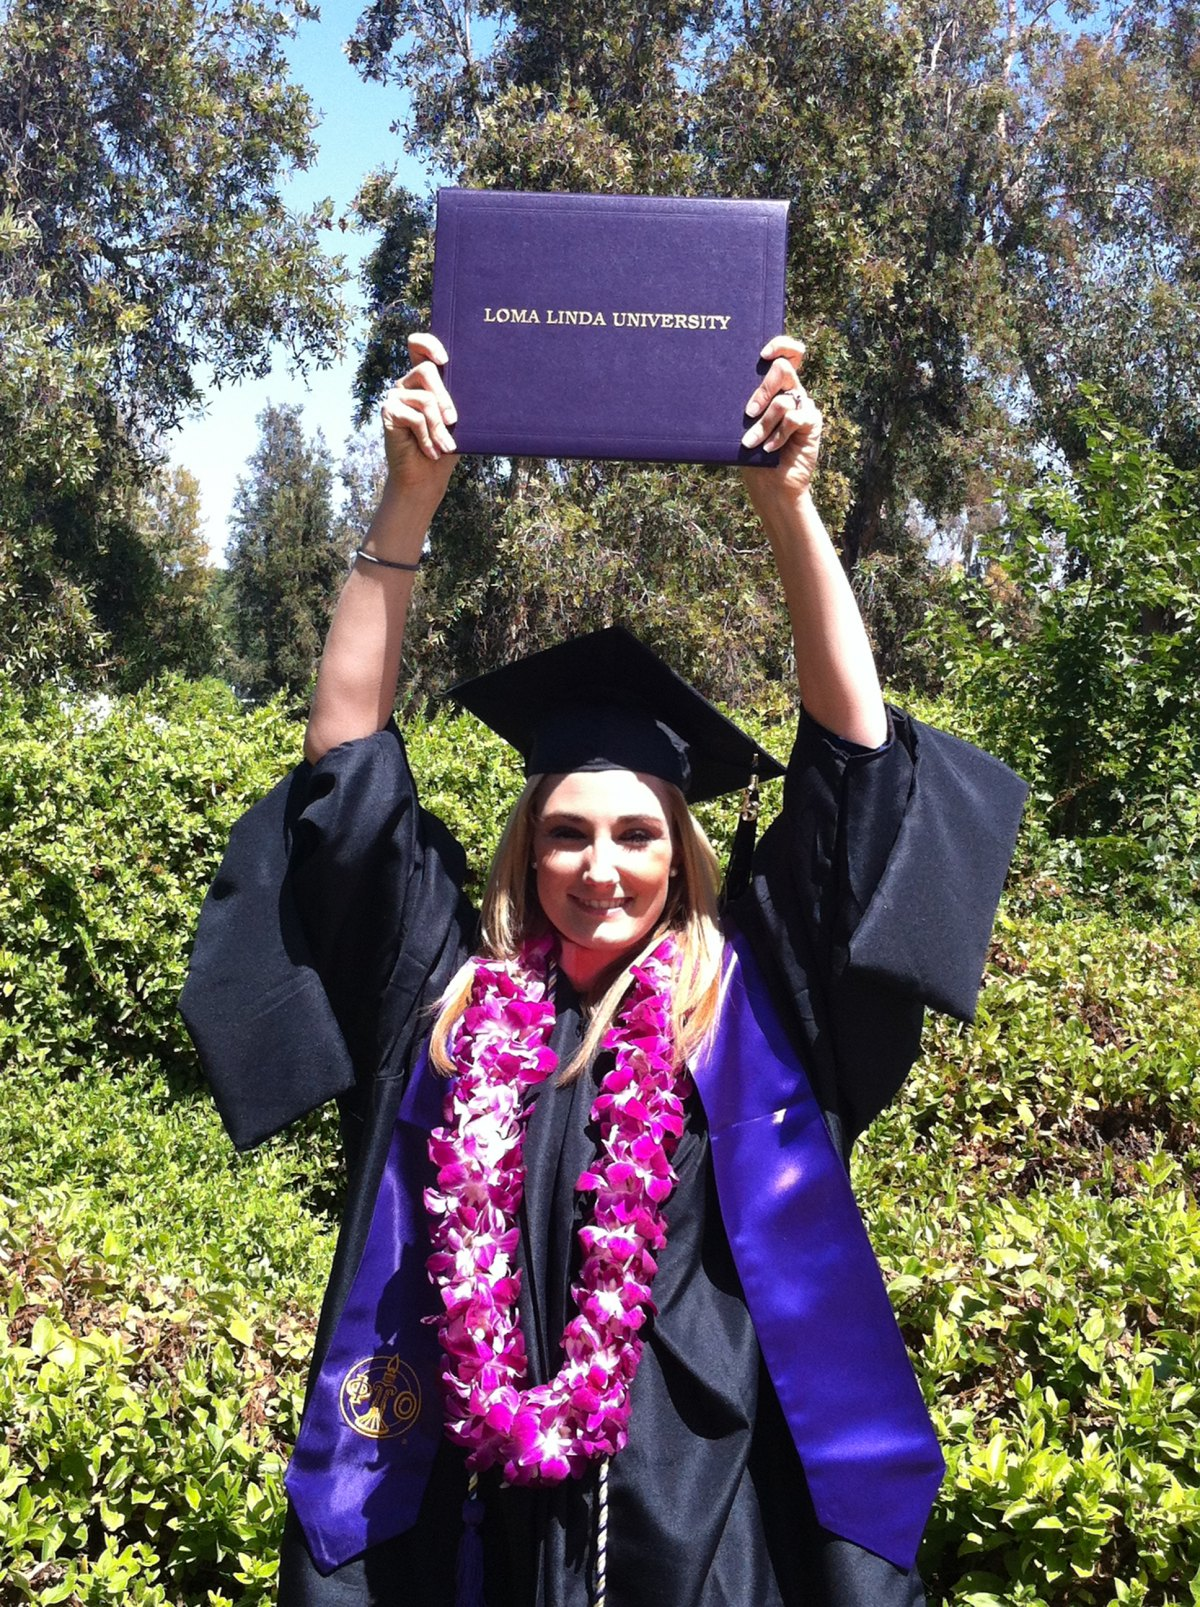 Kelli graduation